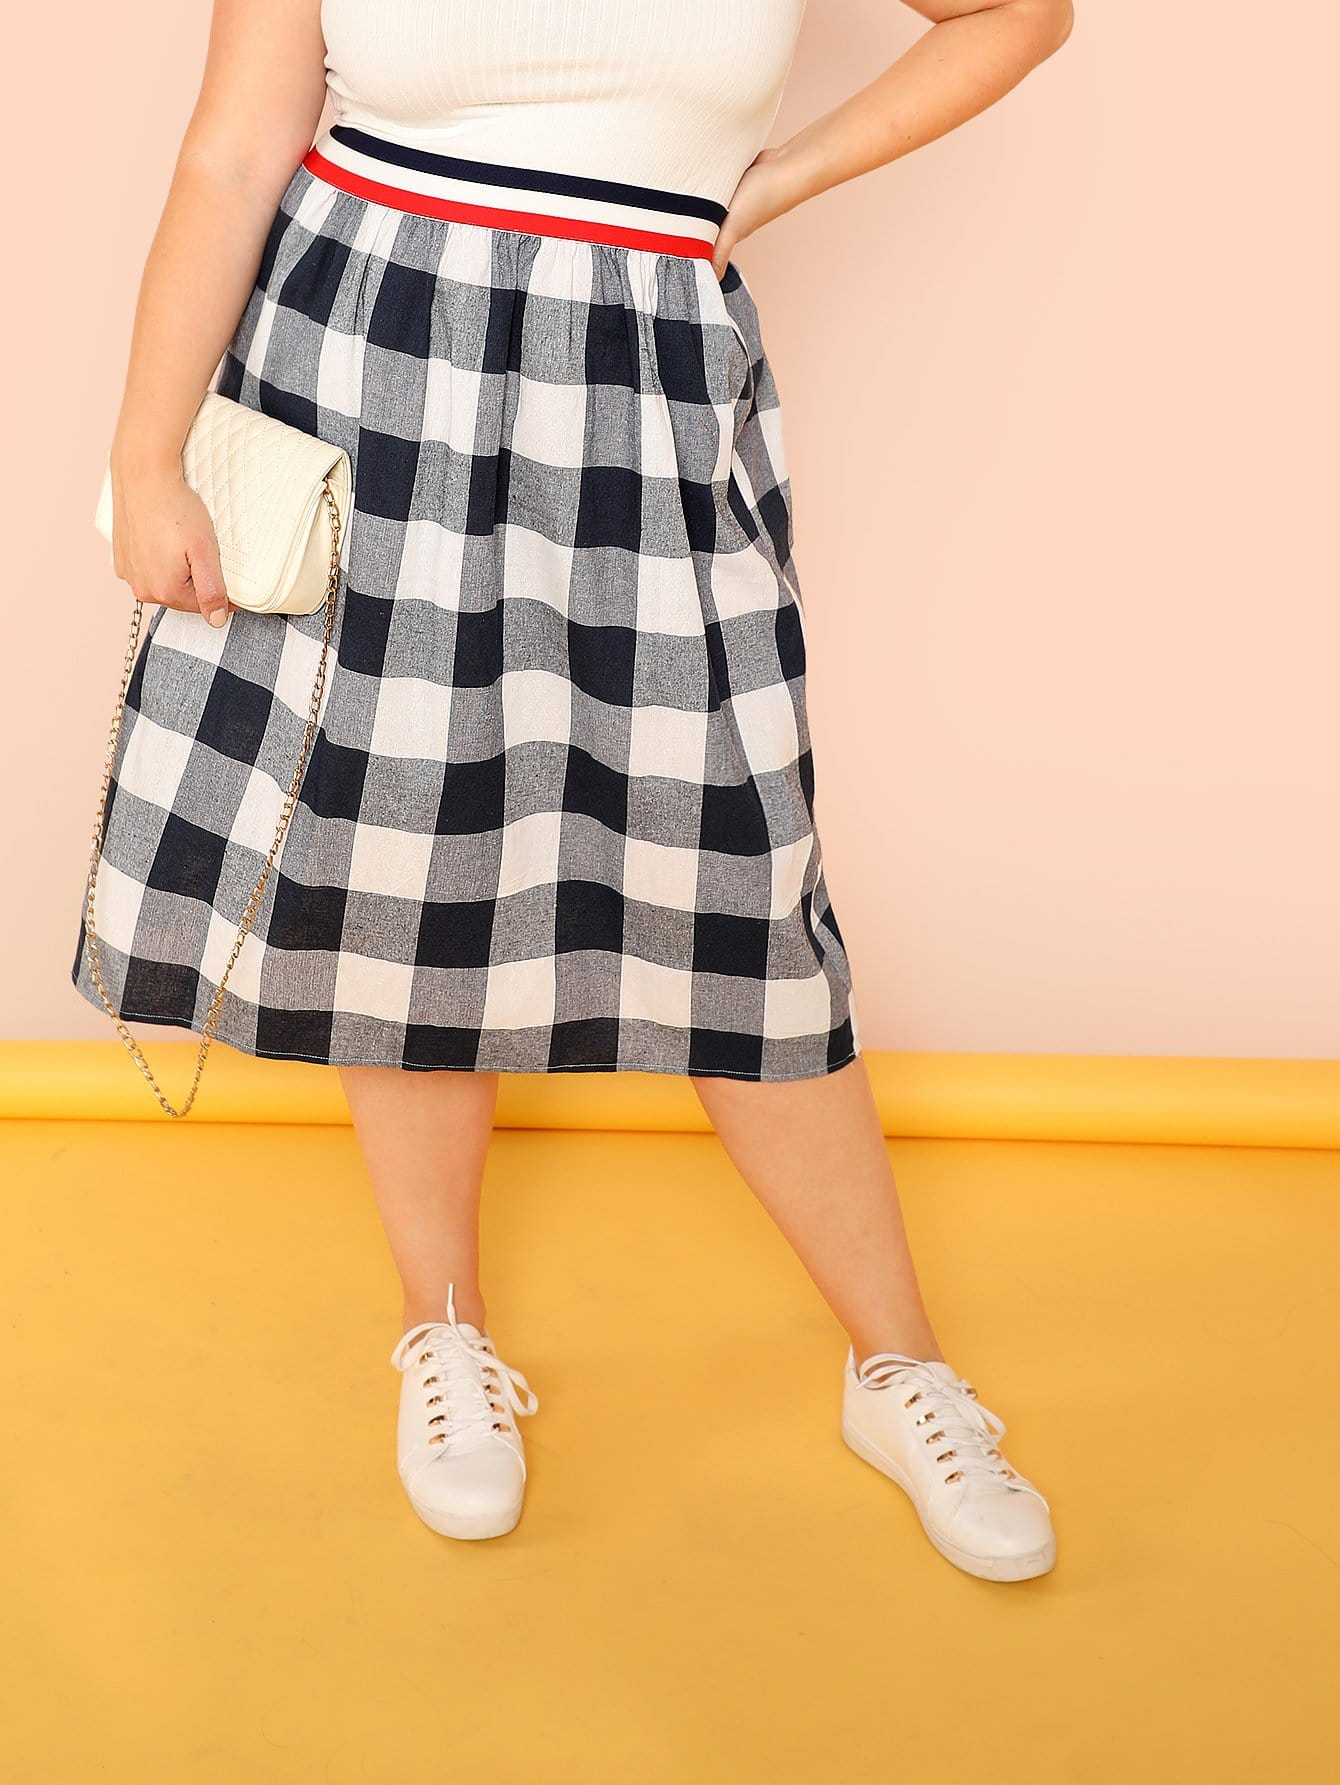 Купить Полосатый пояс Gingham Flare Skirt, null, SheIn